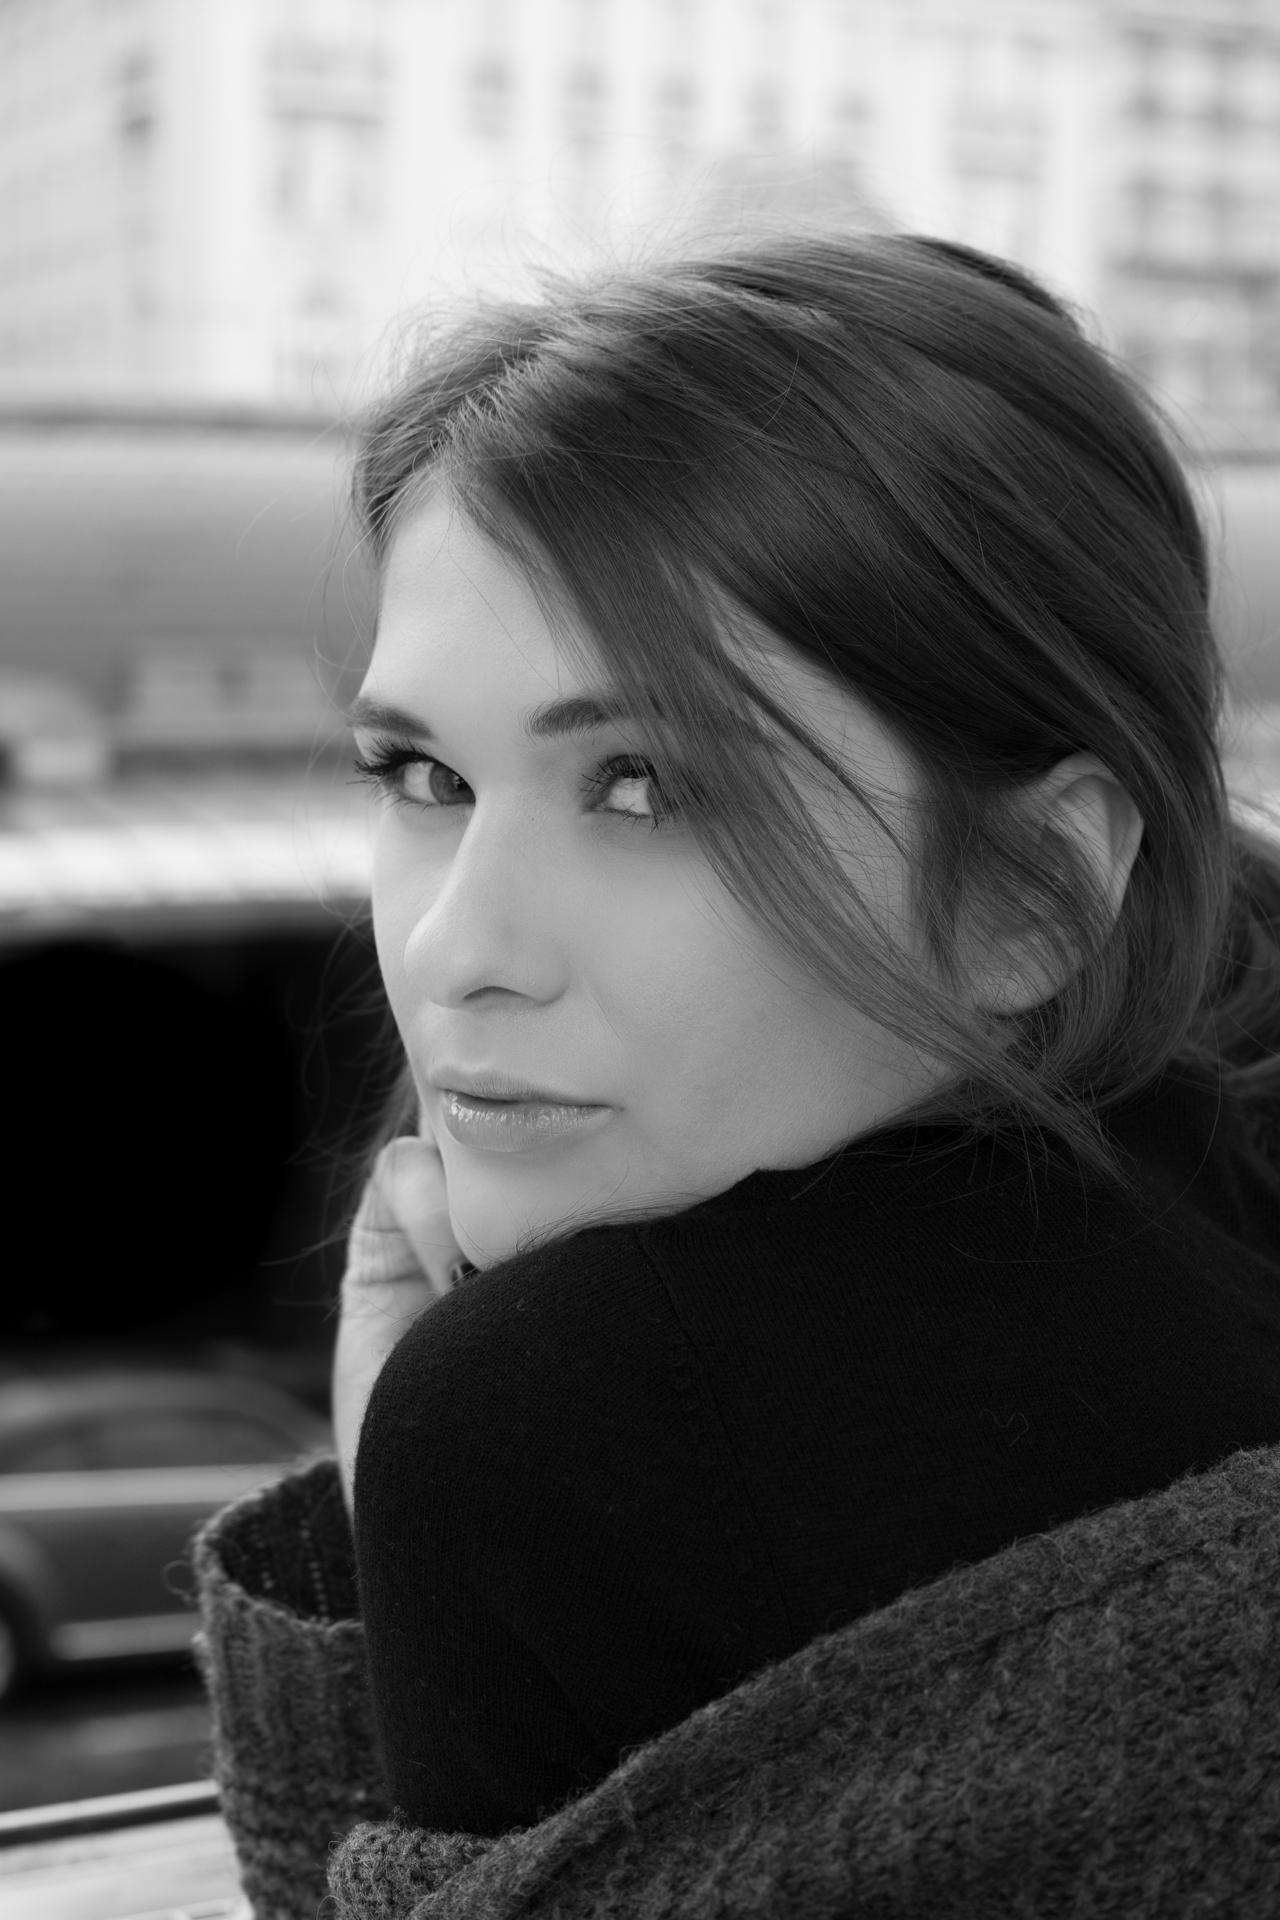 Portraifotos von Stephanie